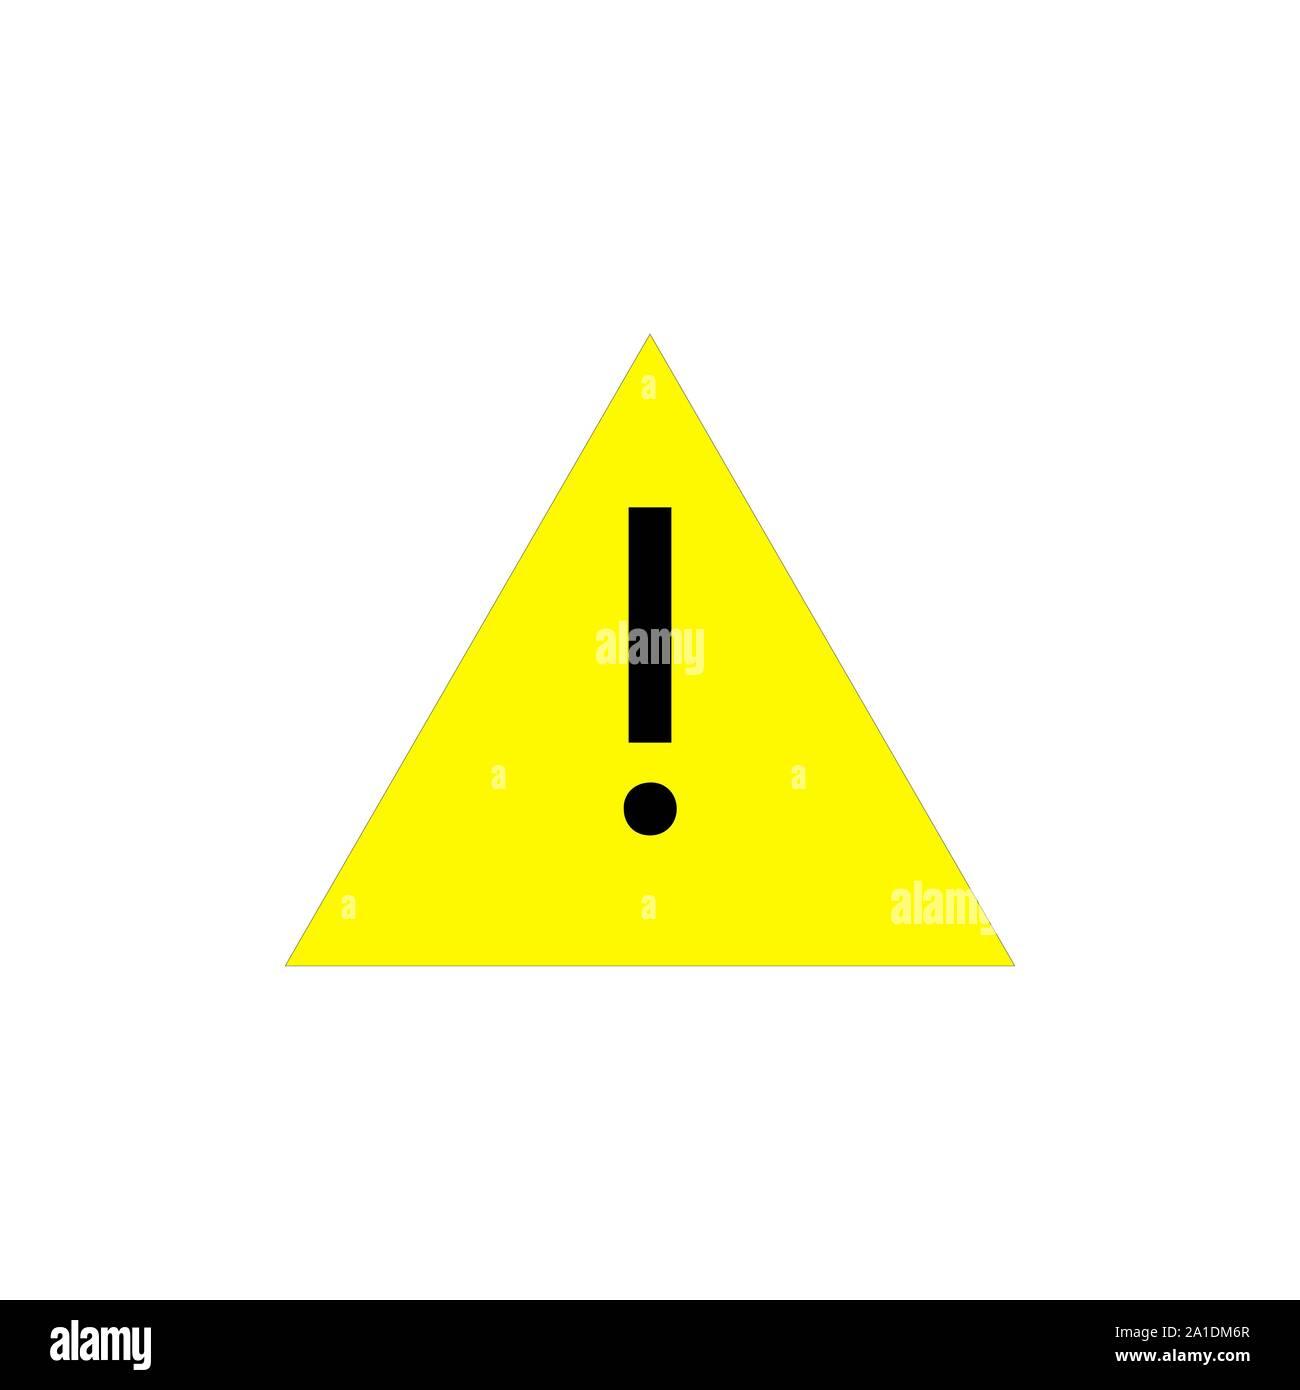 https www alamyimages fr attention pictogramme triangle jaune avec un point d exclamation icone d alerte vector illustration isole sur fond blanc image327912895 html